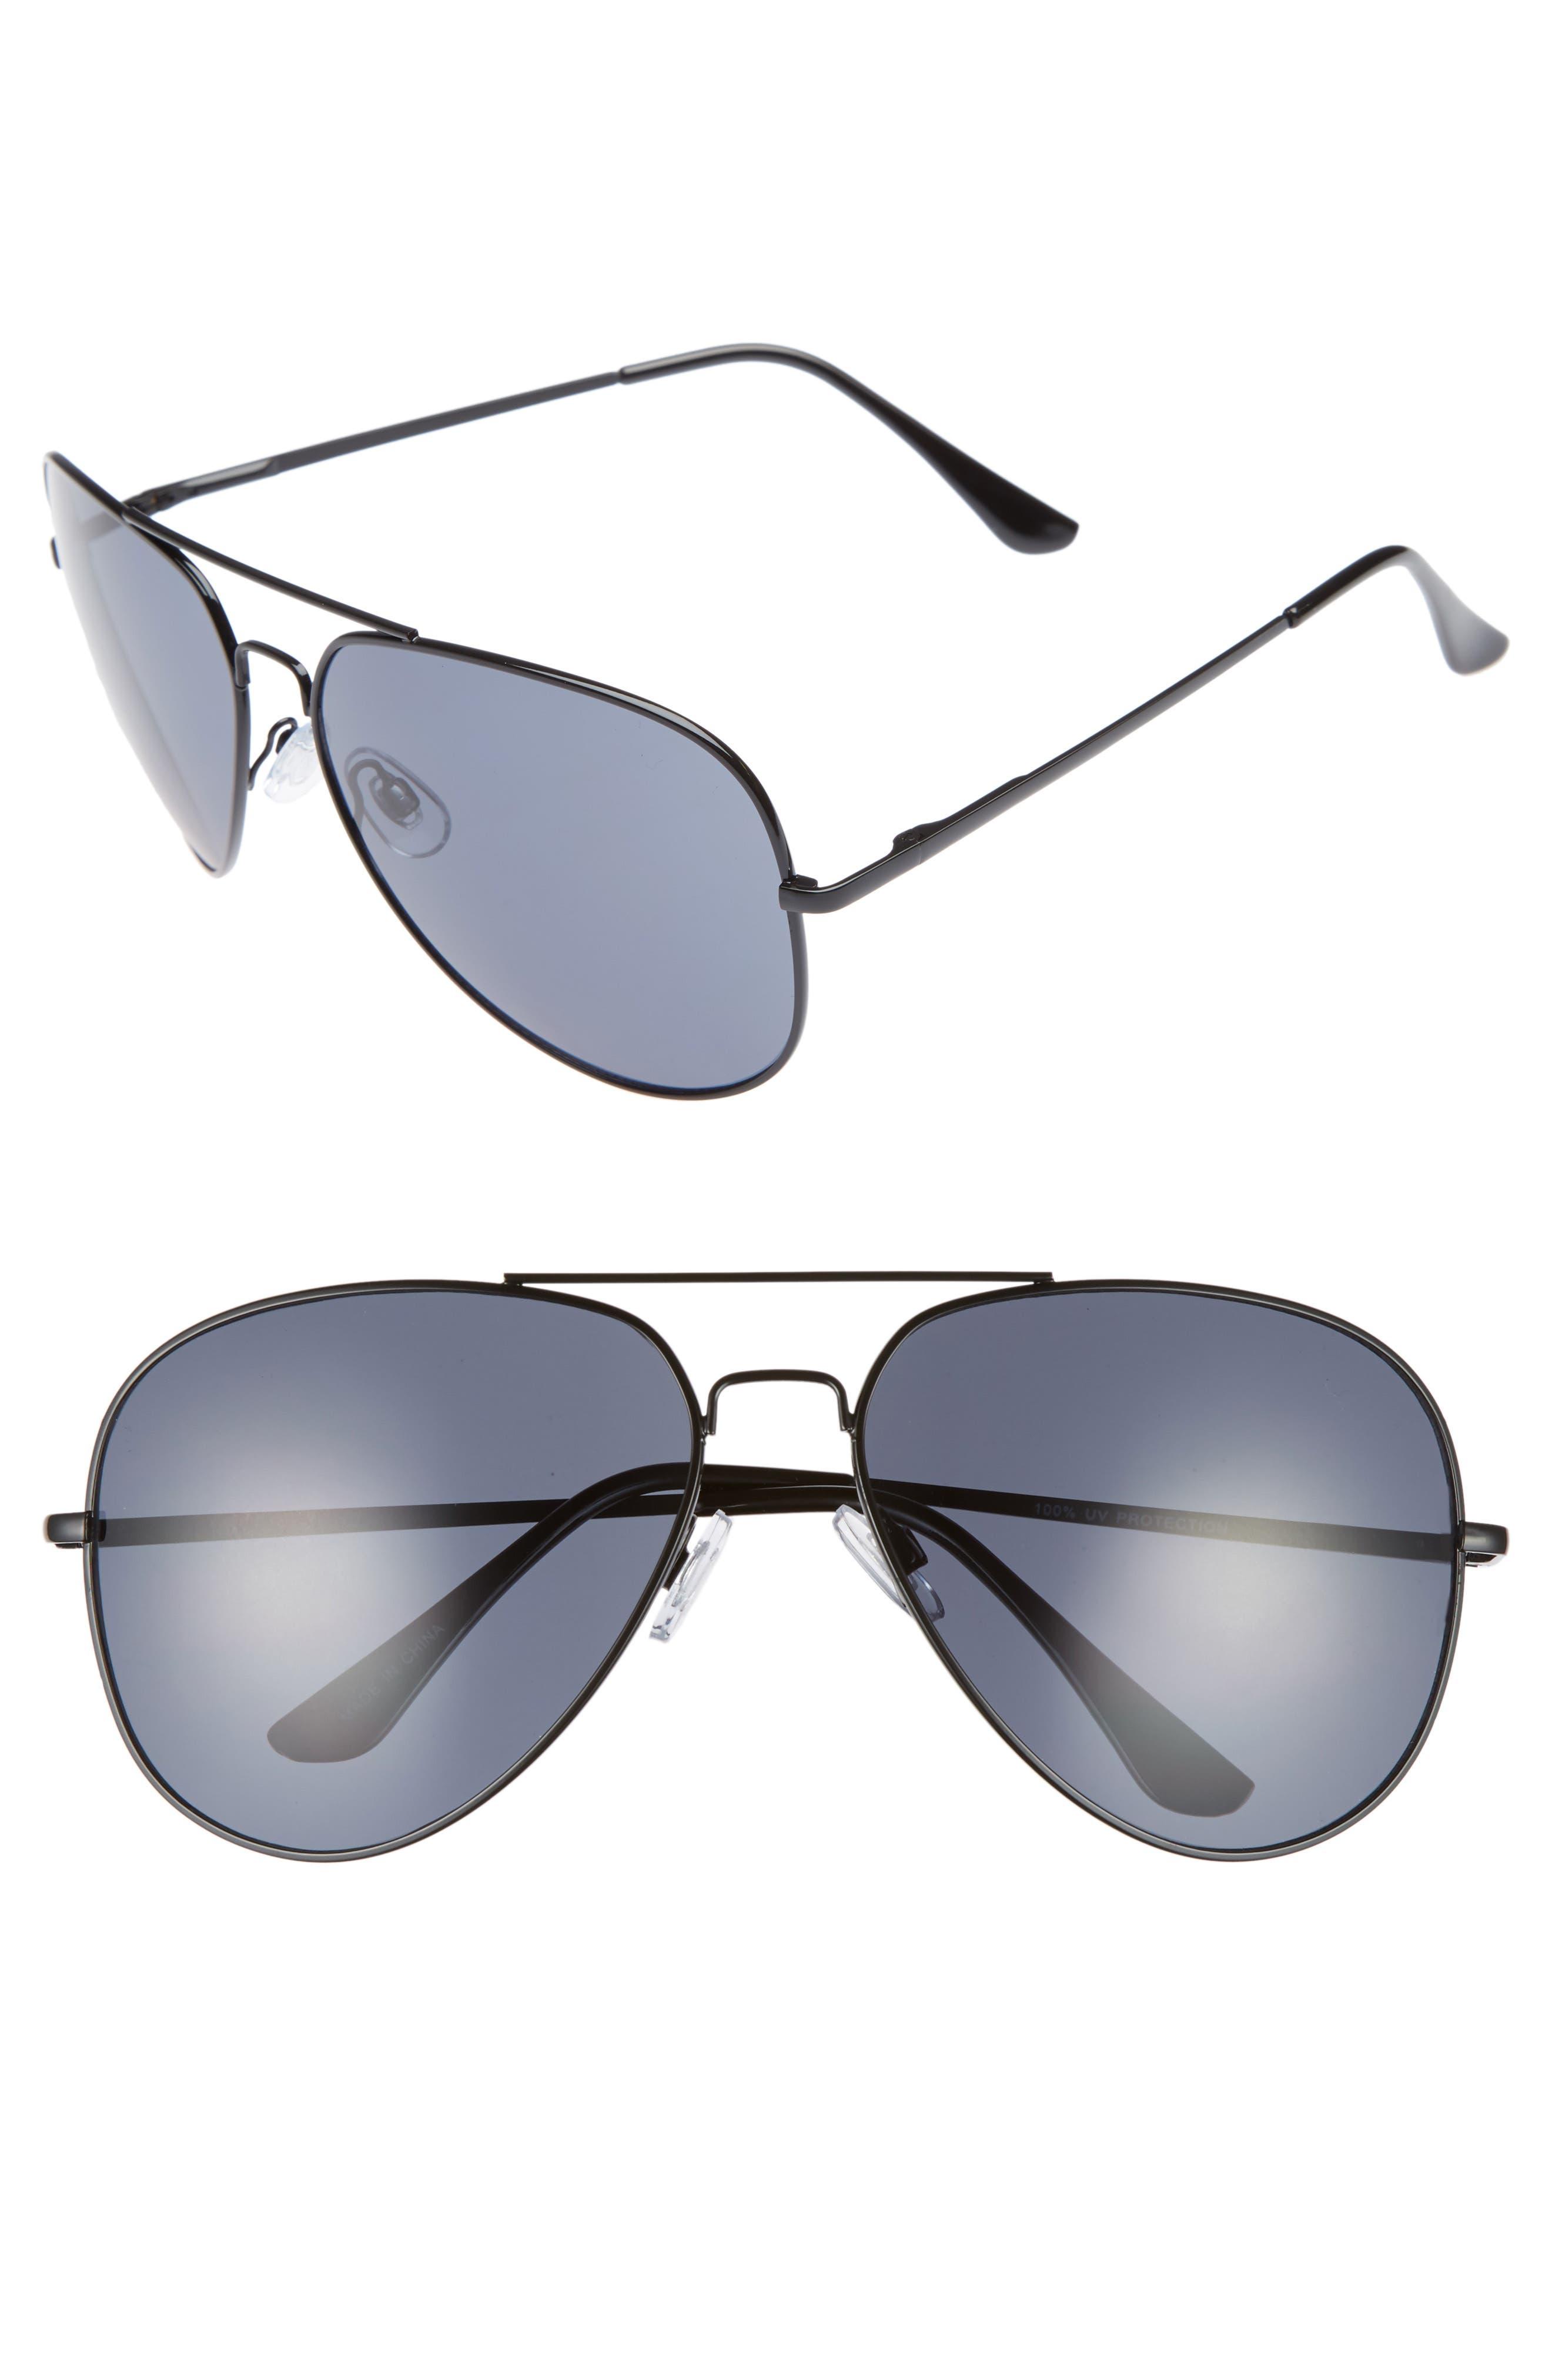 60mm Large Aviator Sunglasses,                         Main,                         color, Black/ Black